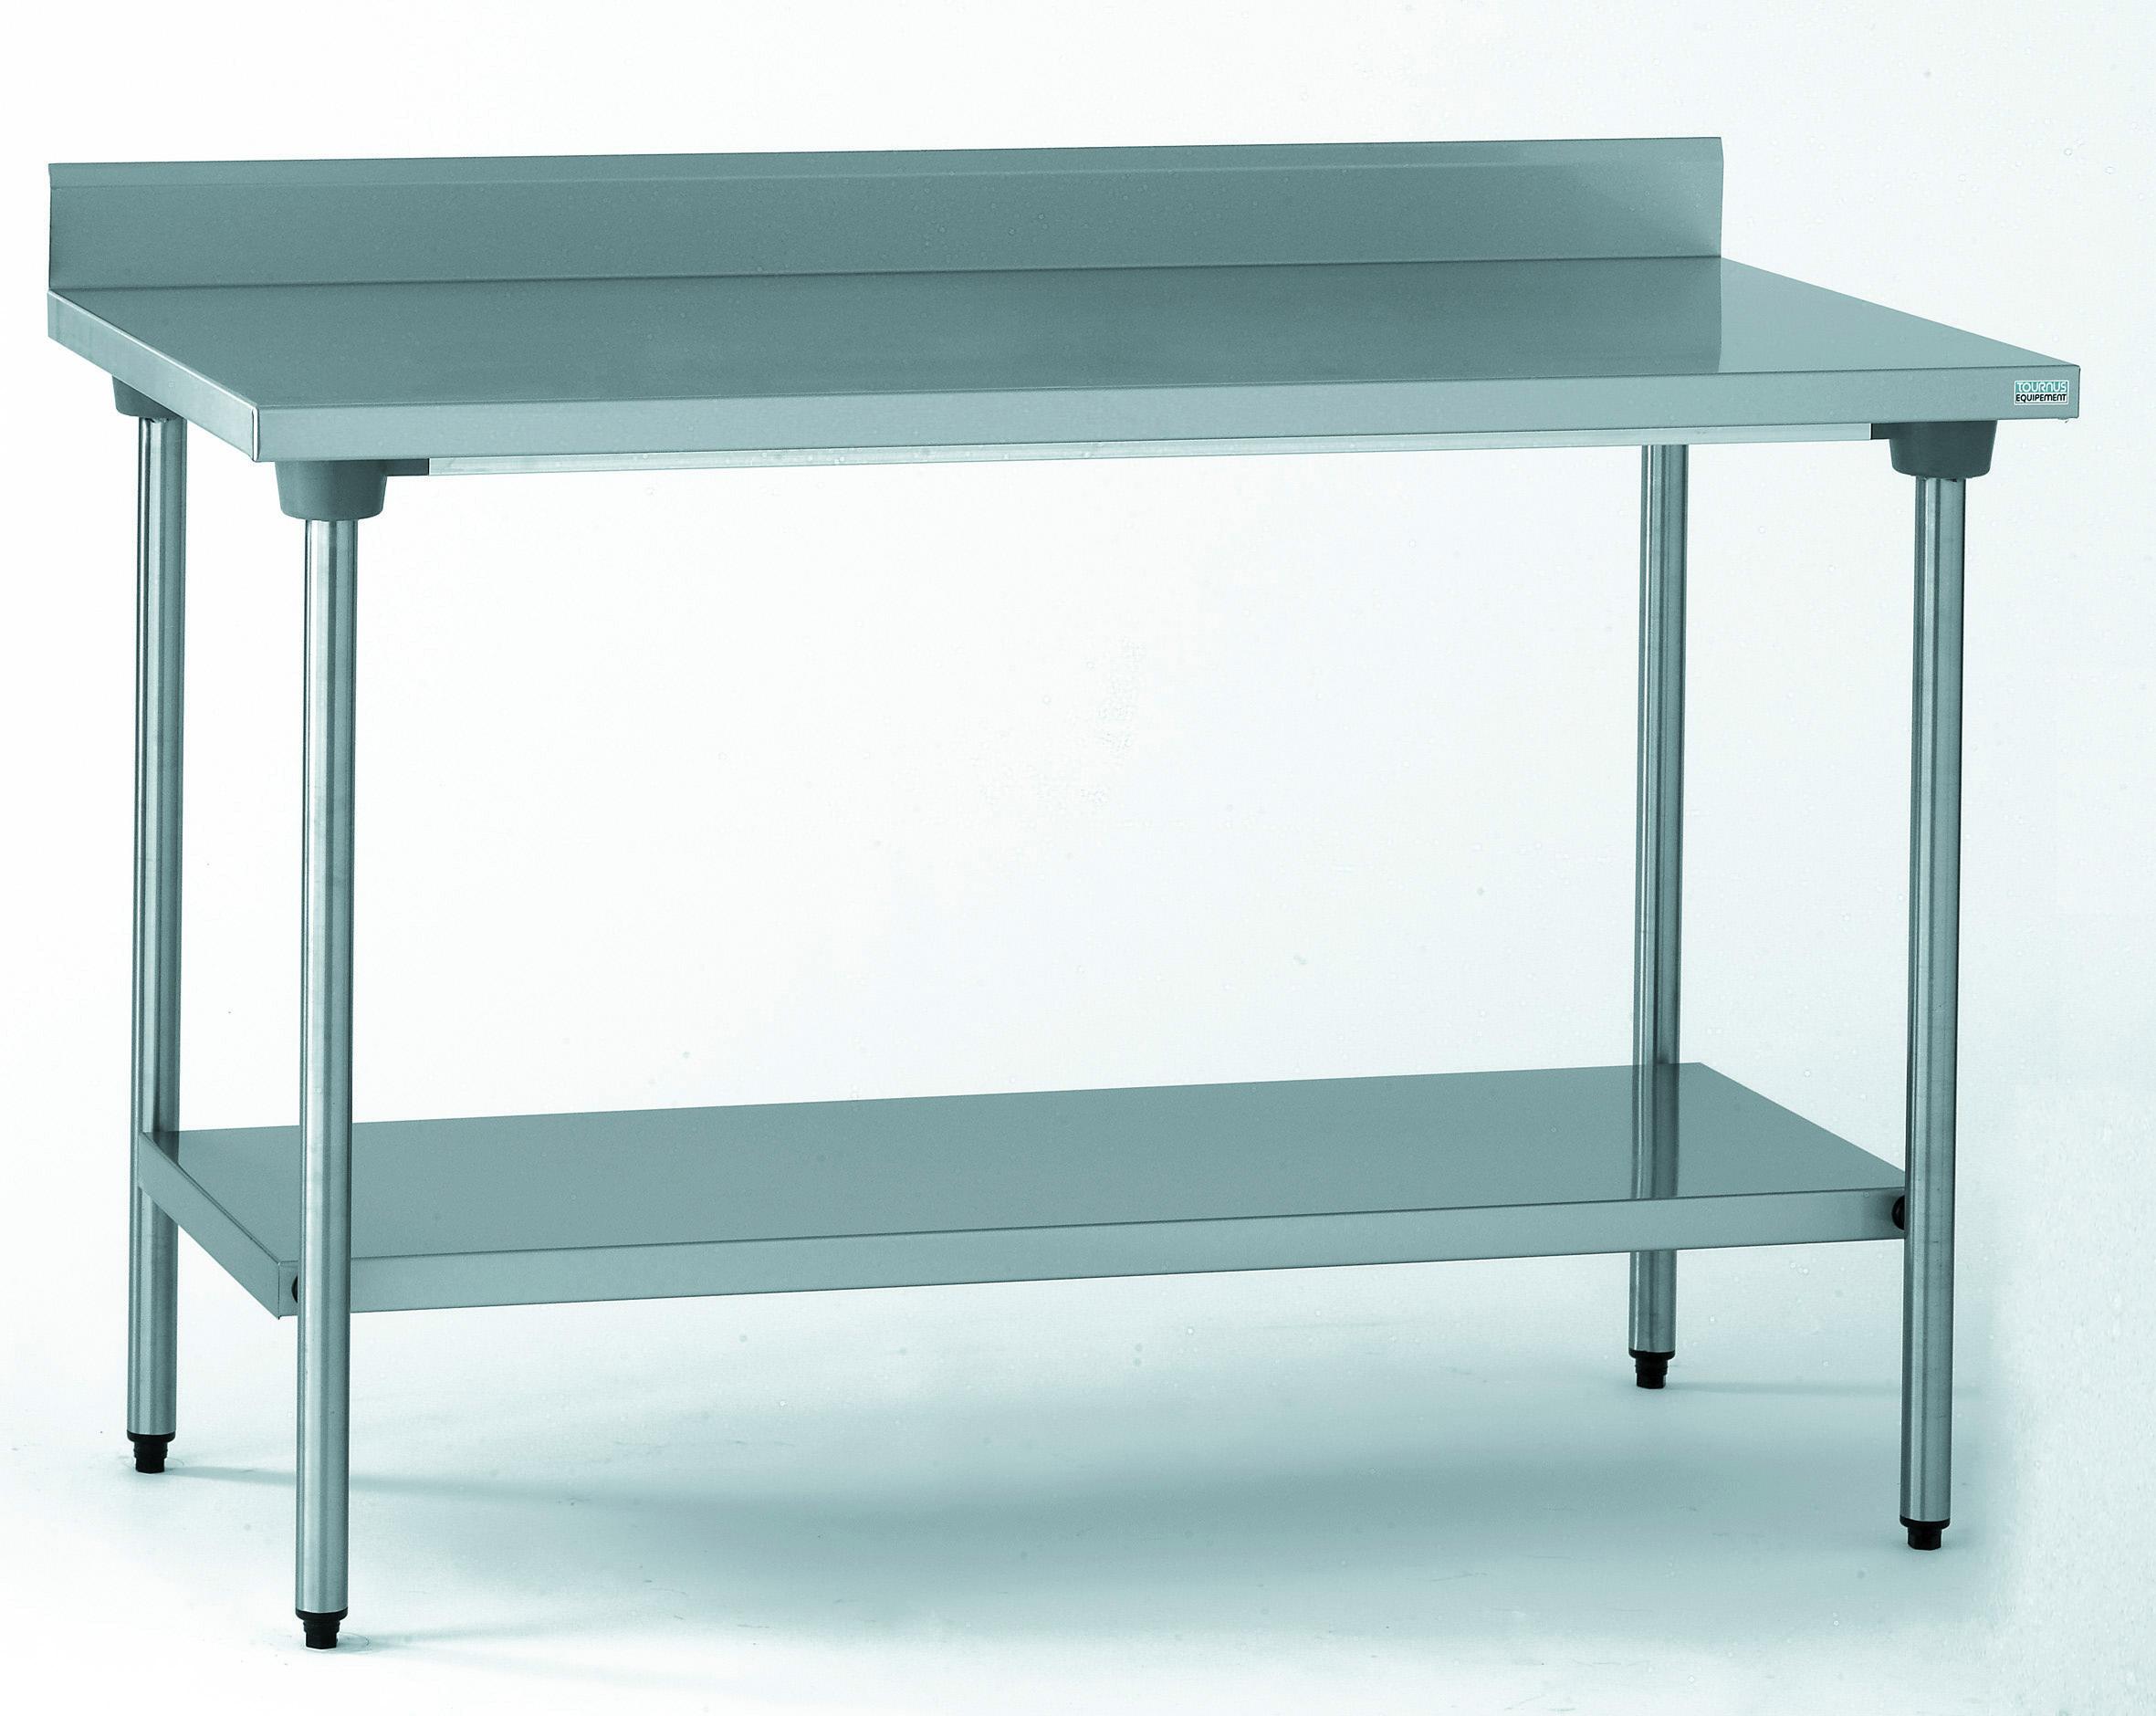 TABLE CHR ADOS+ETAG. 700X1400